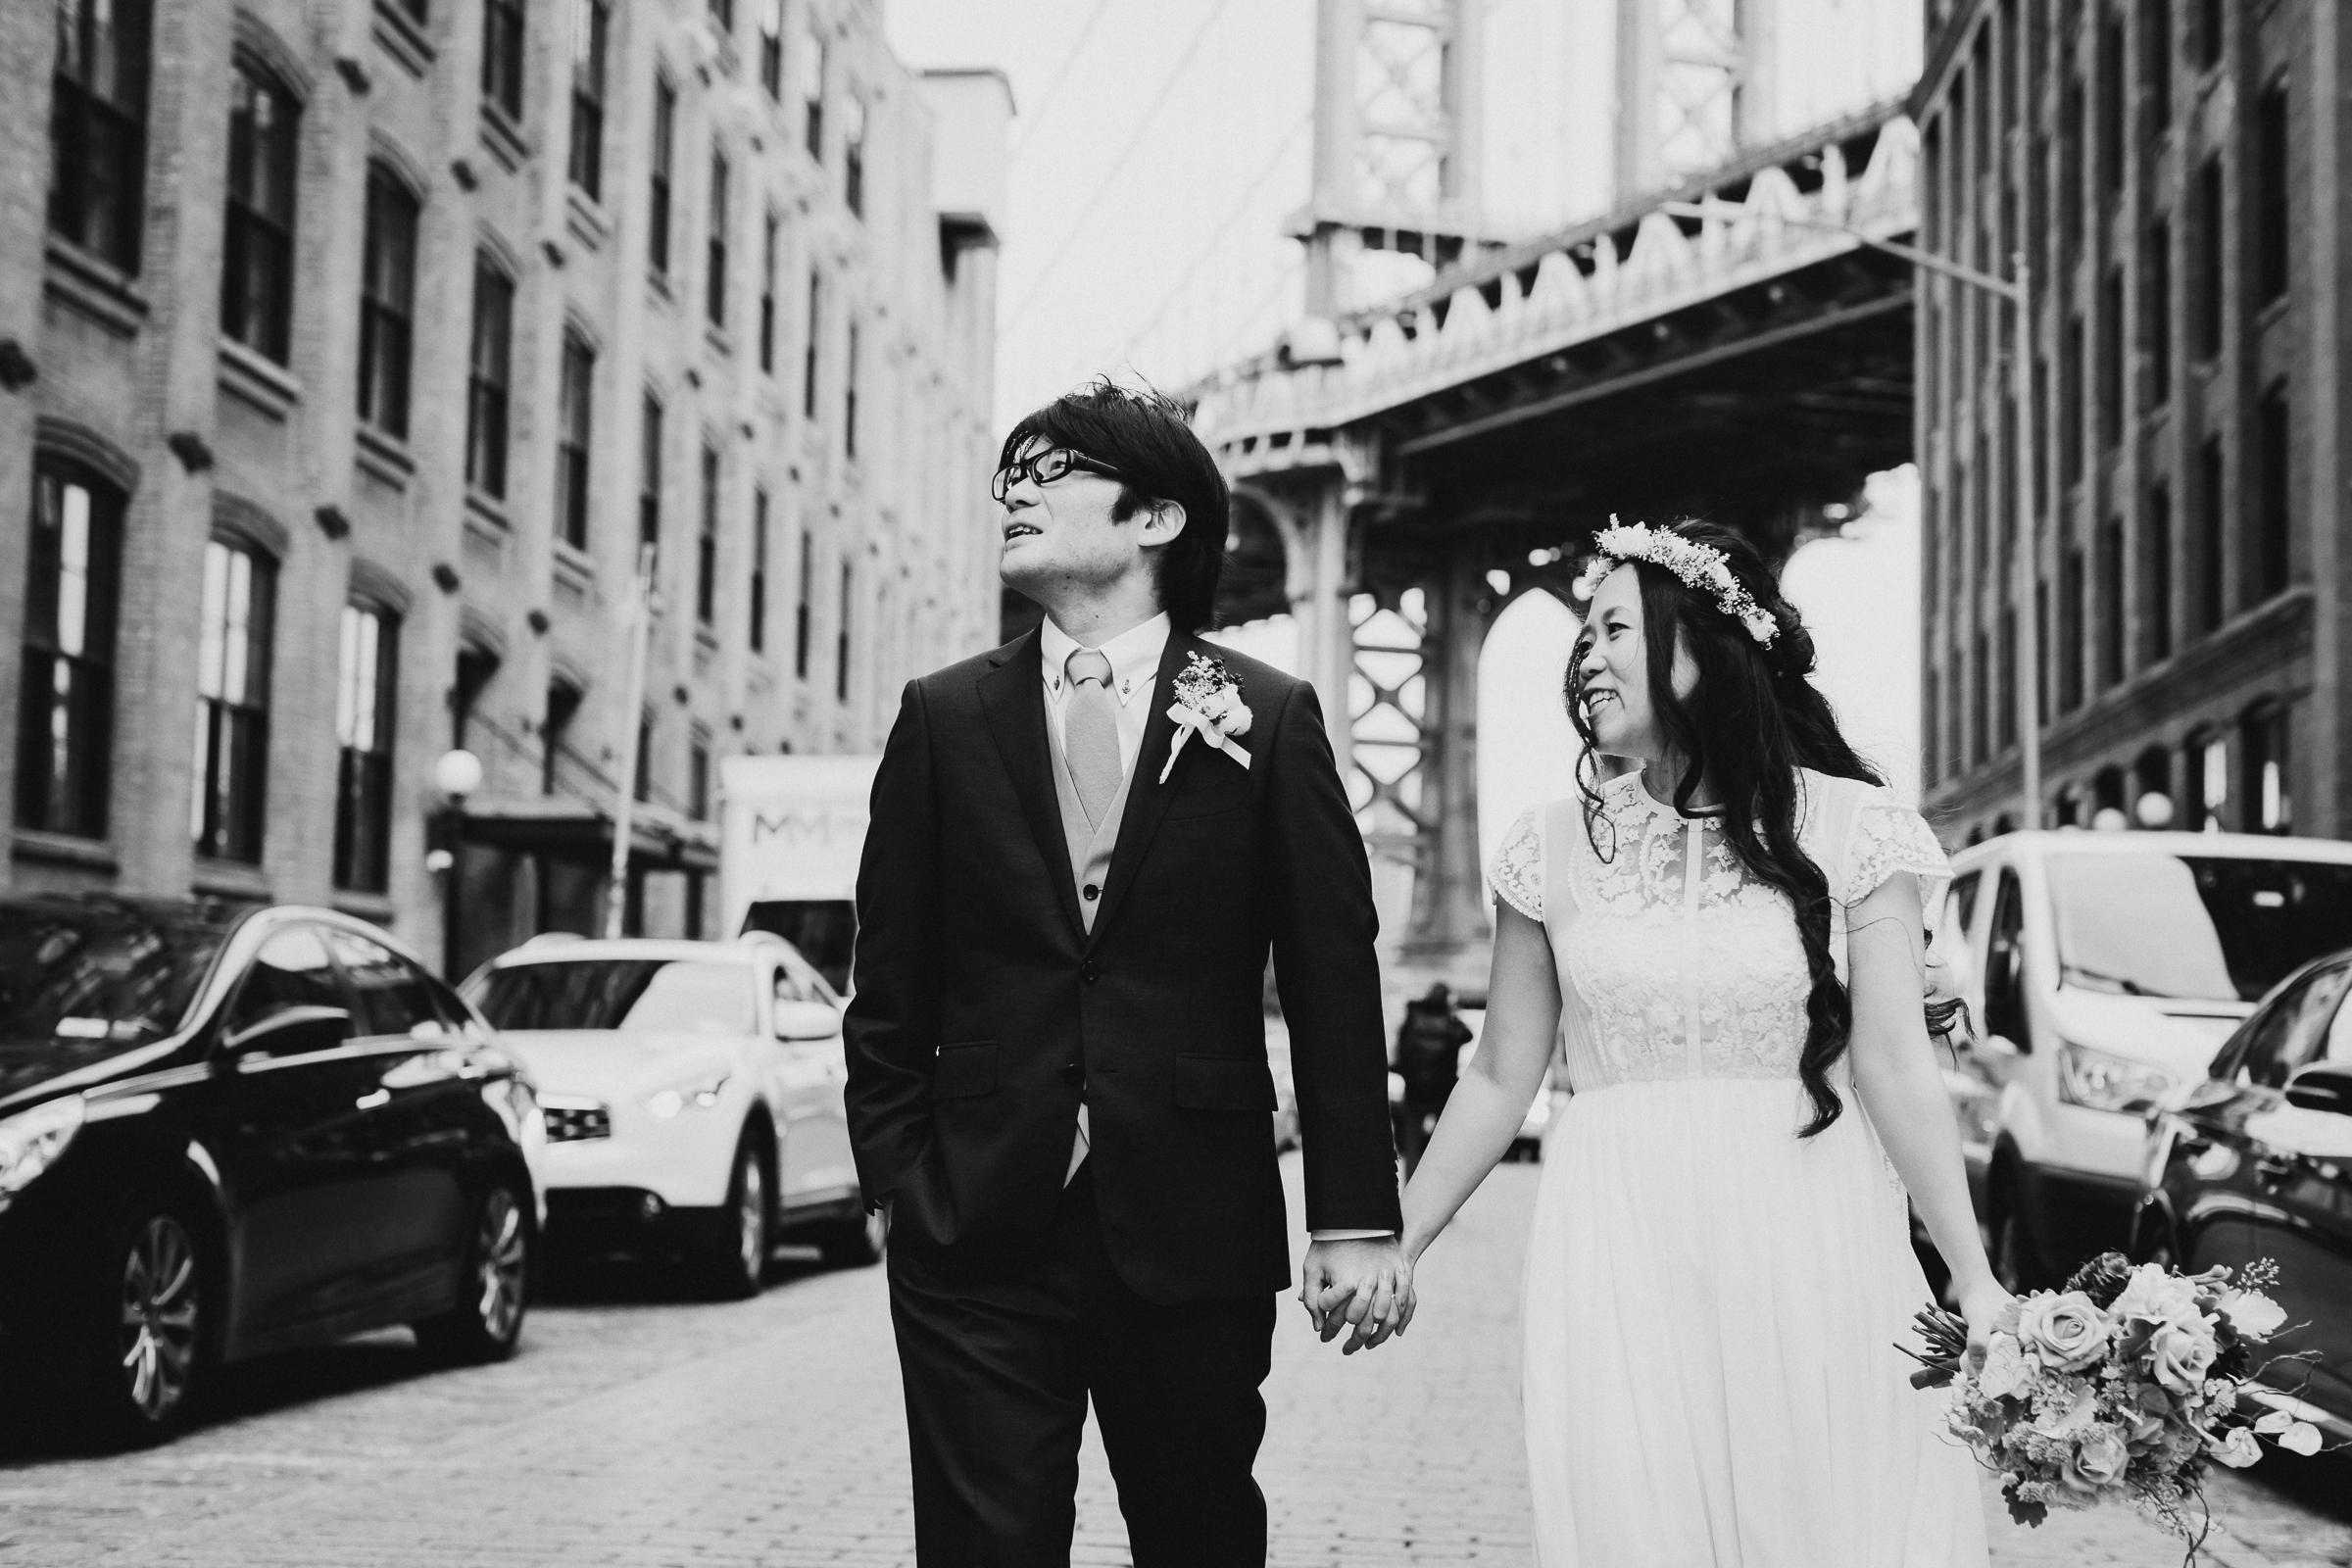 Central-Park-Brooklyn-Bridge-Dumbo-NYC-Documentary-Wedding-Photographer-4.jpg